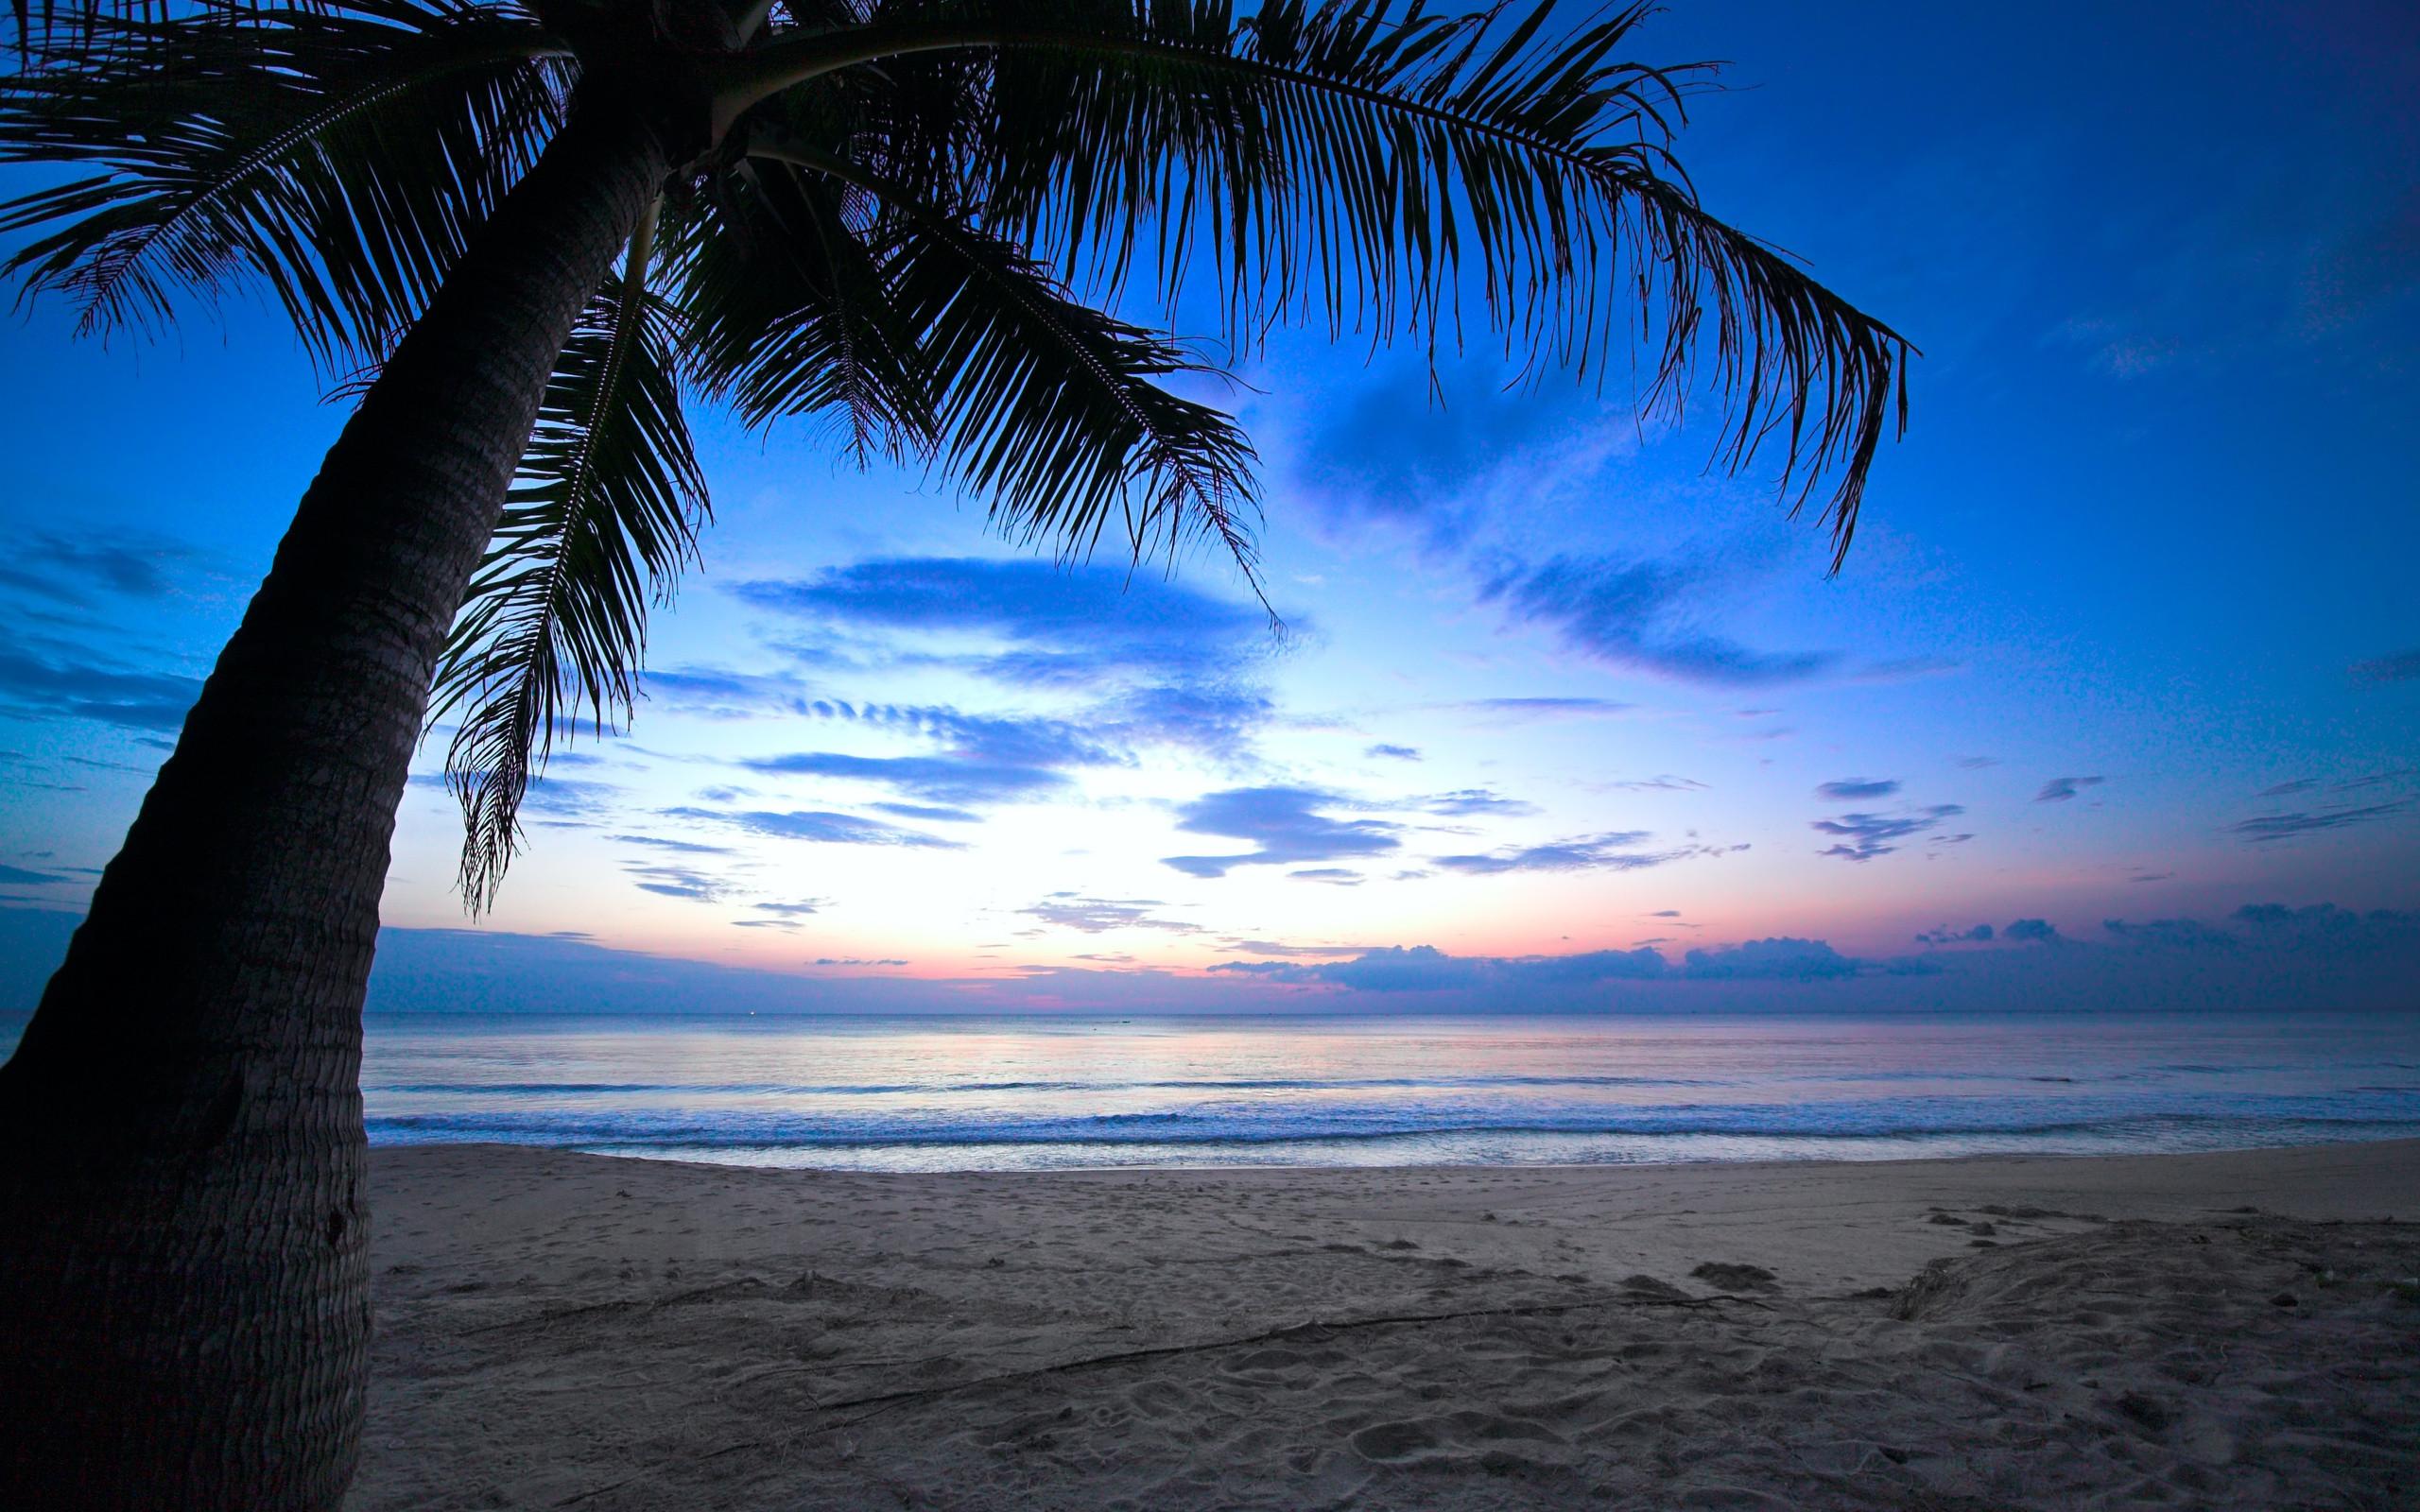 Caribbean Night Sky   cloudy sky weeping palm tree tropical sunset  caribbean ocean wallpaper .